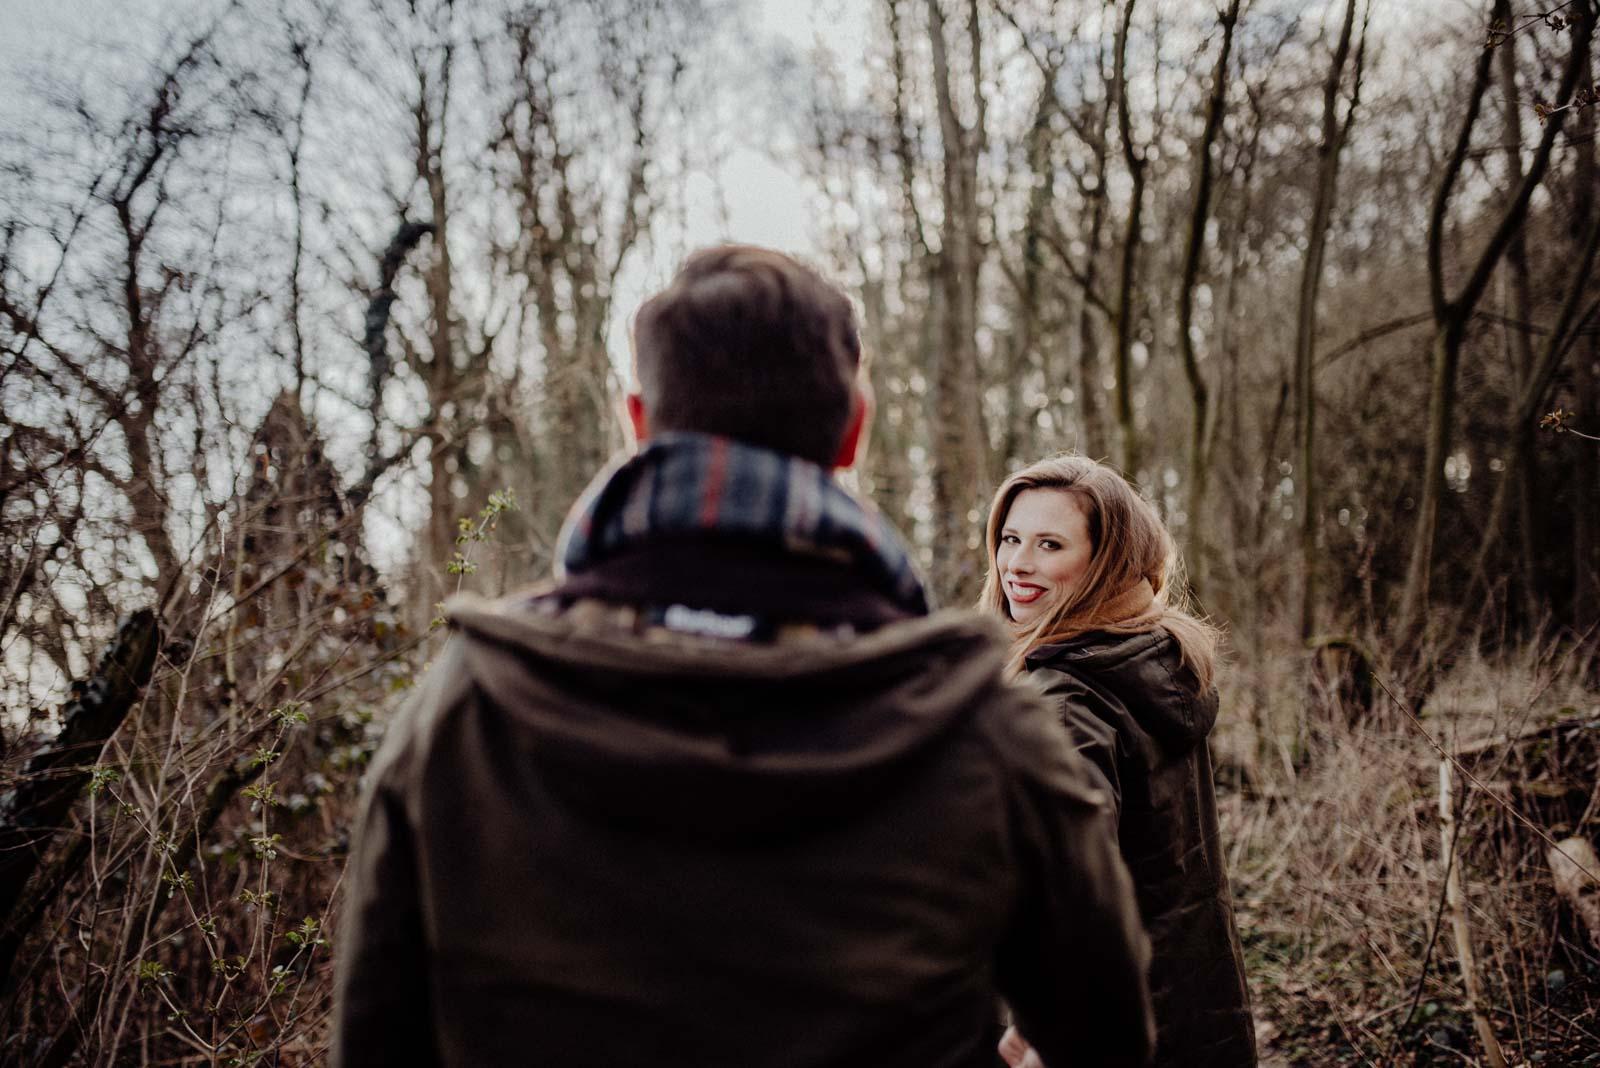 029-Babybauch-Shooting-Wald-Natur-Witten-Familienfotografie-Familienfotos